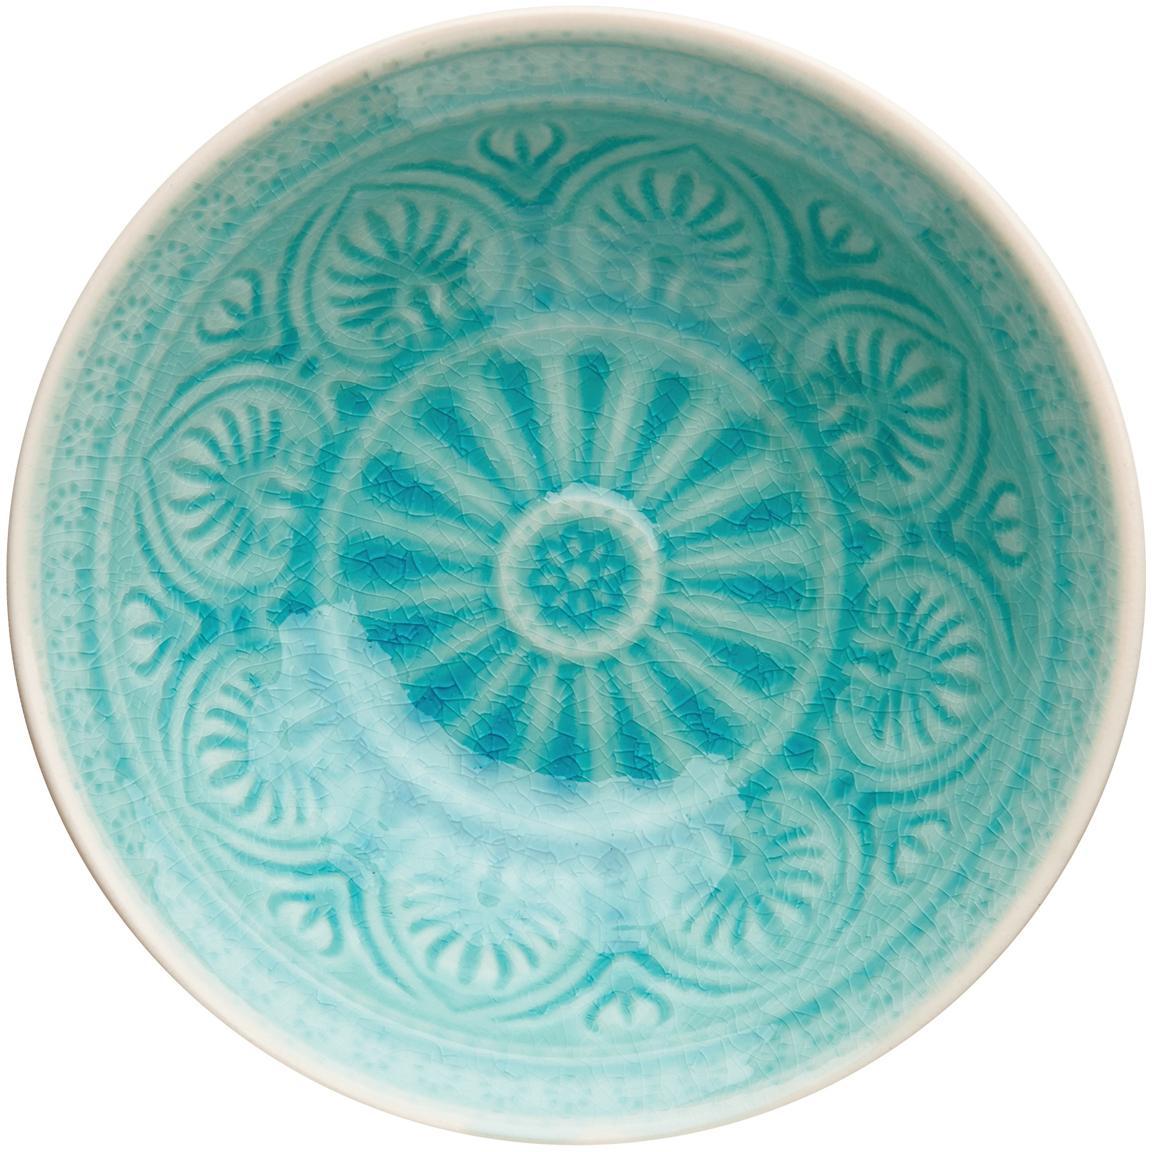 Ciotola Sumatra, Terracotta, Turchese, Ø 14 cm